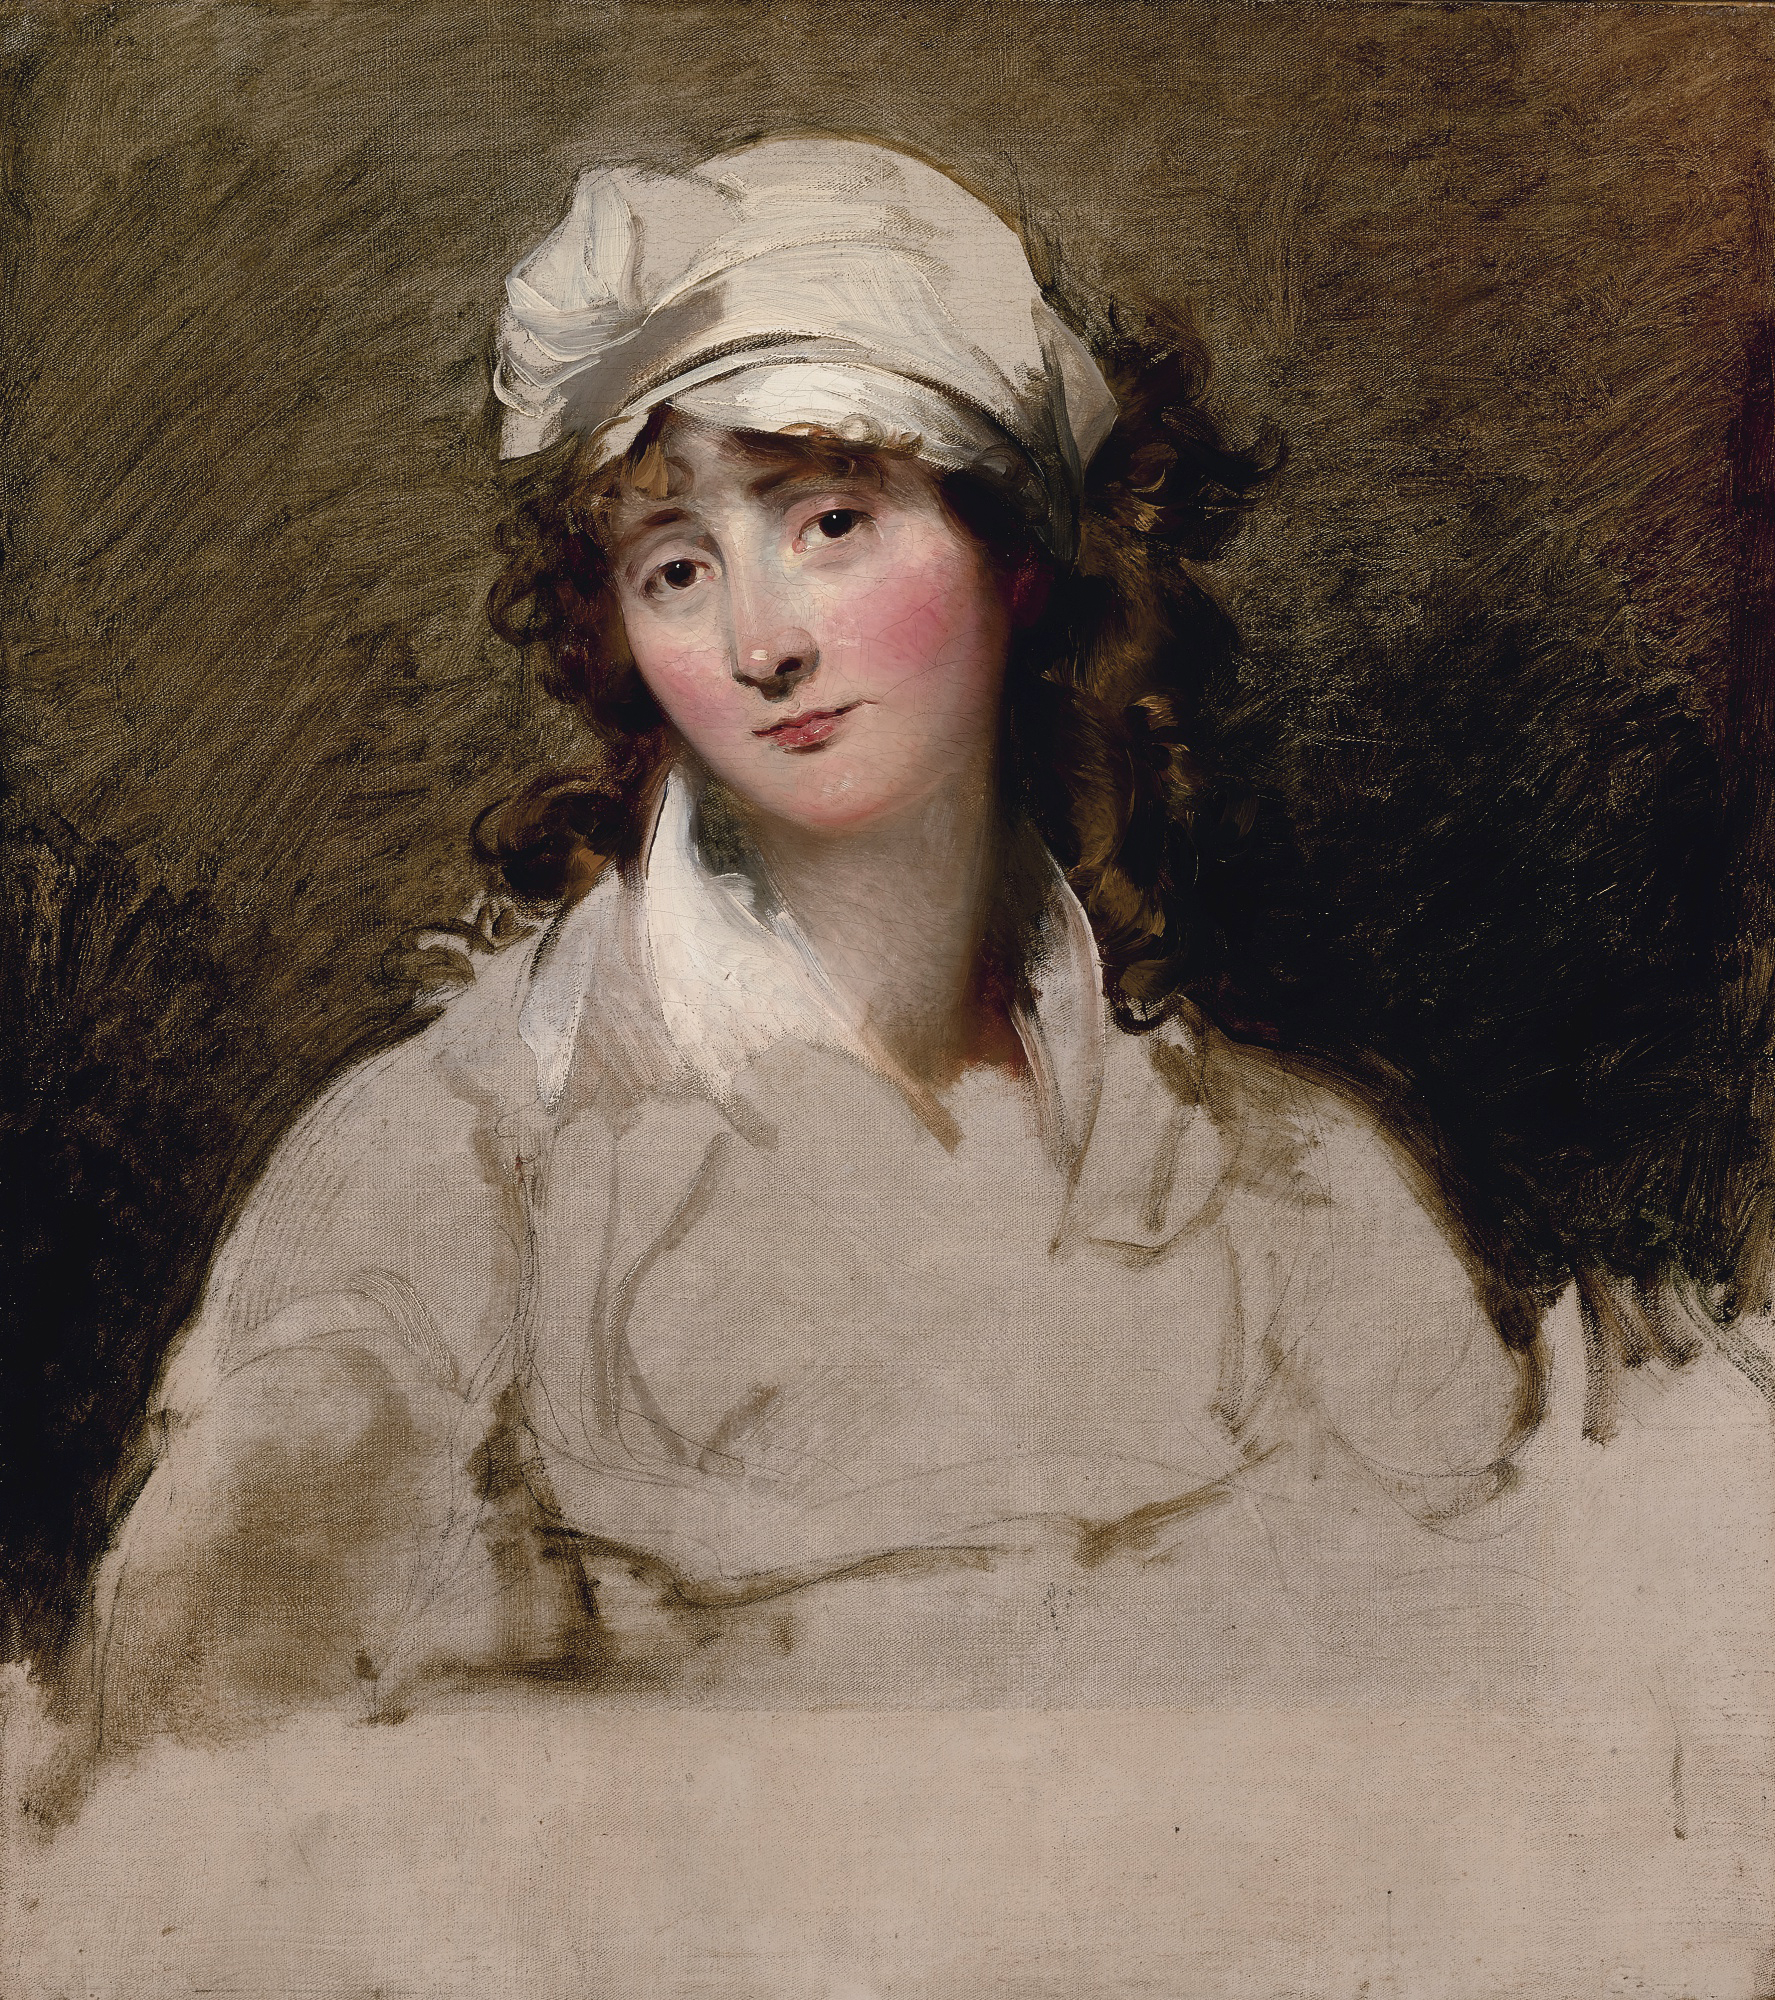 Elizabeth Spender